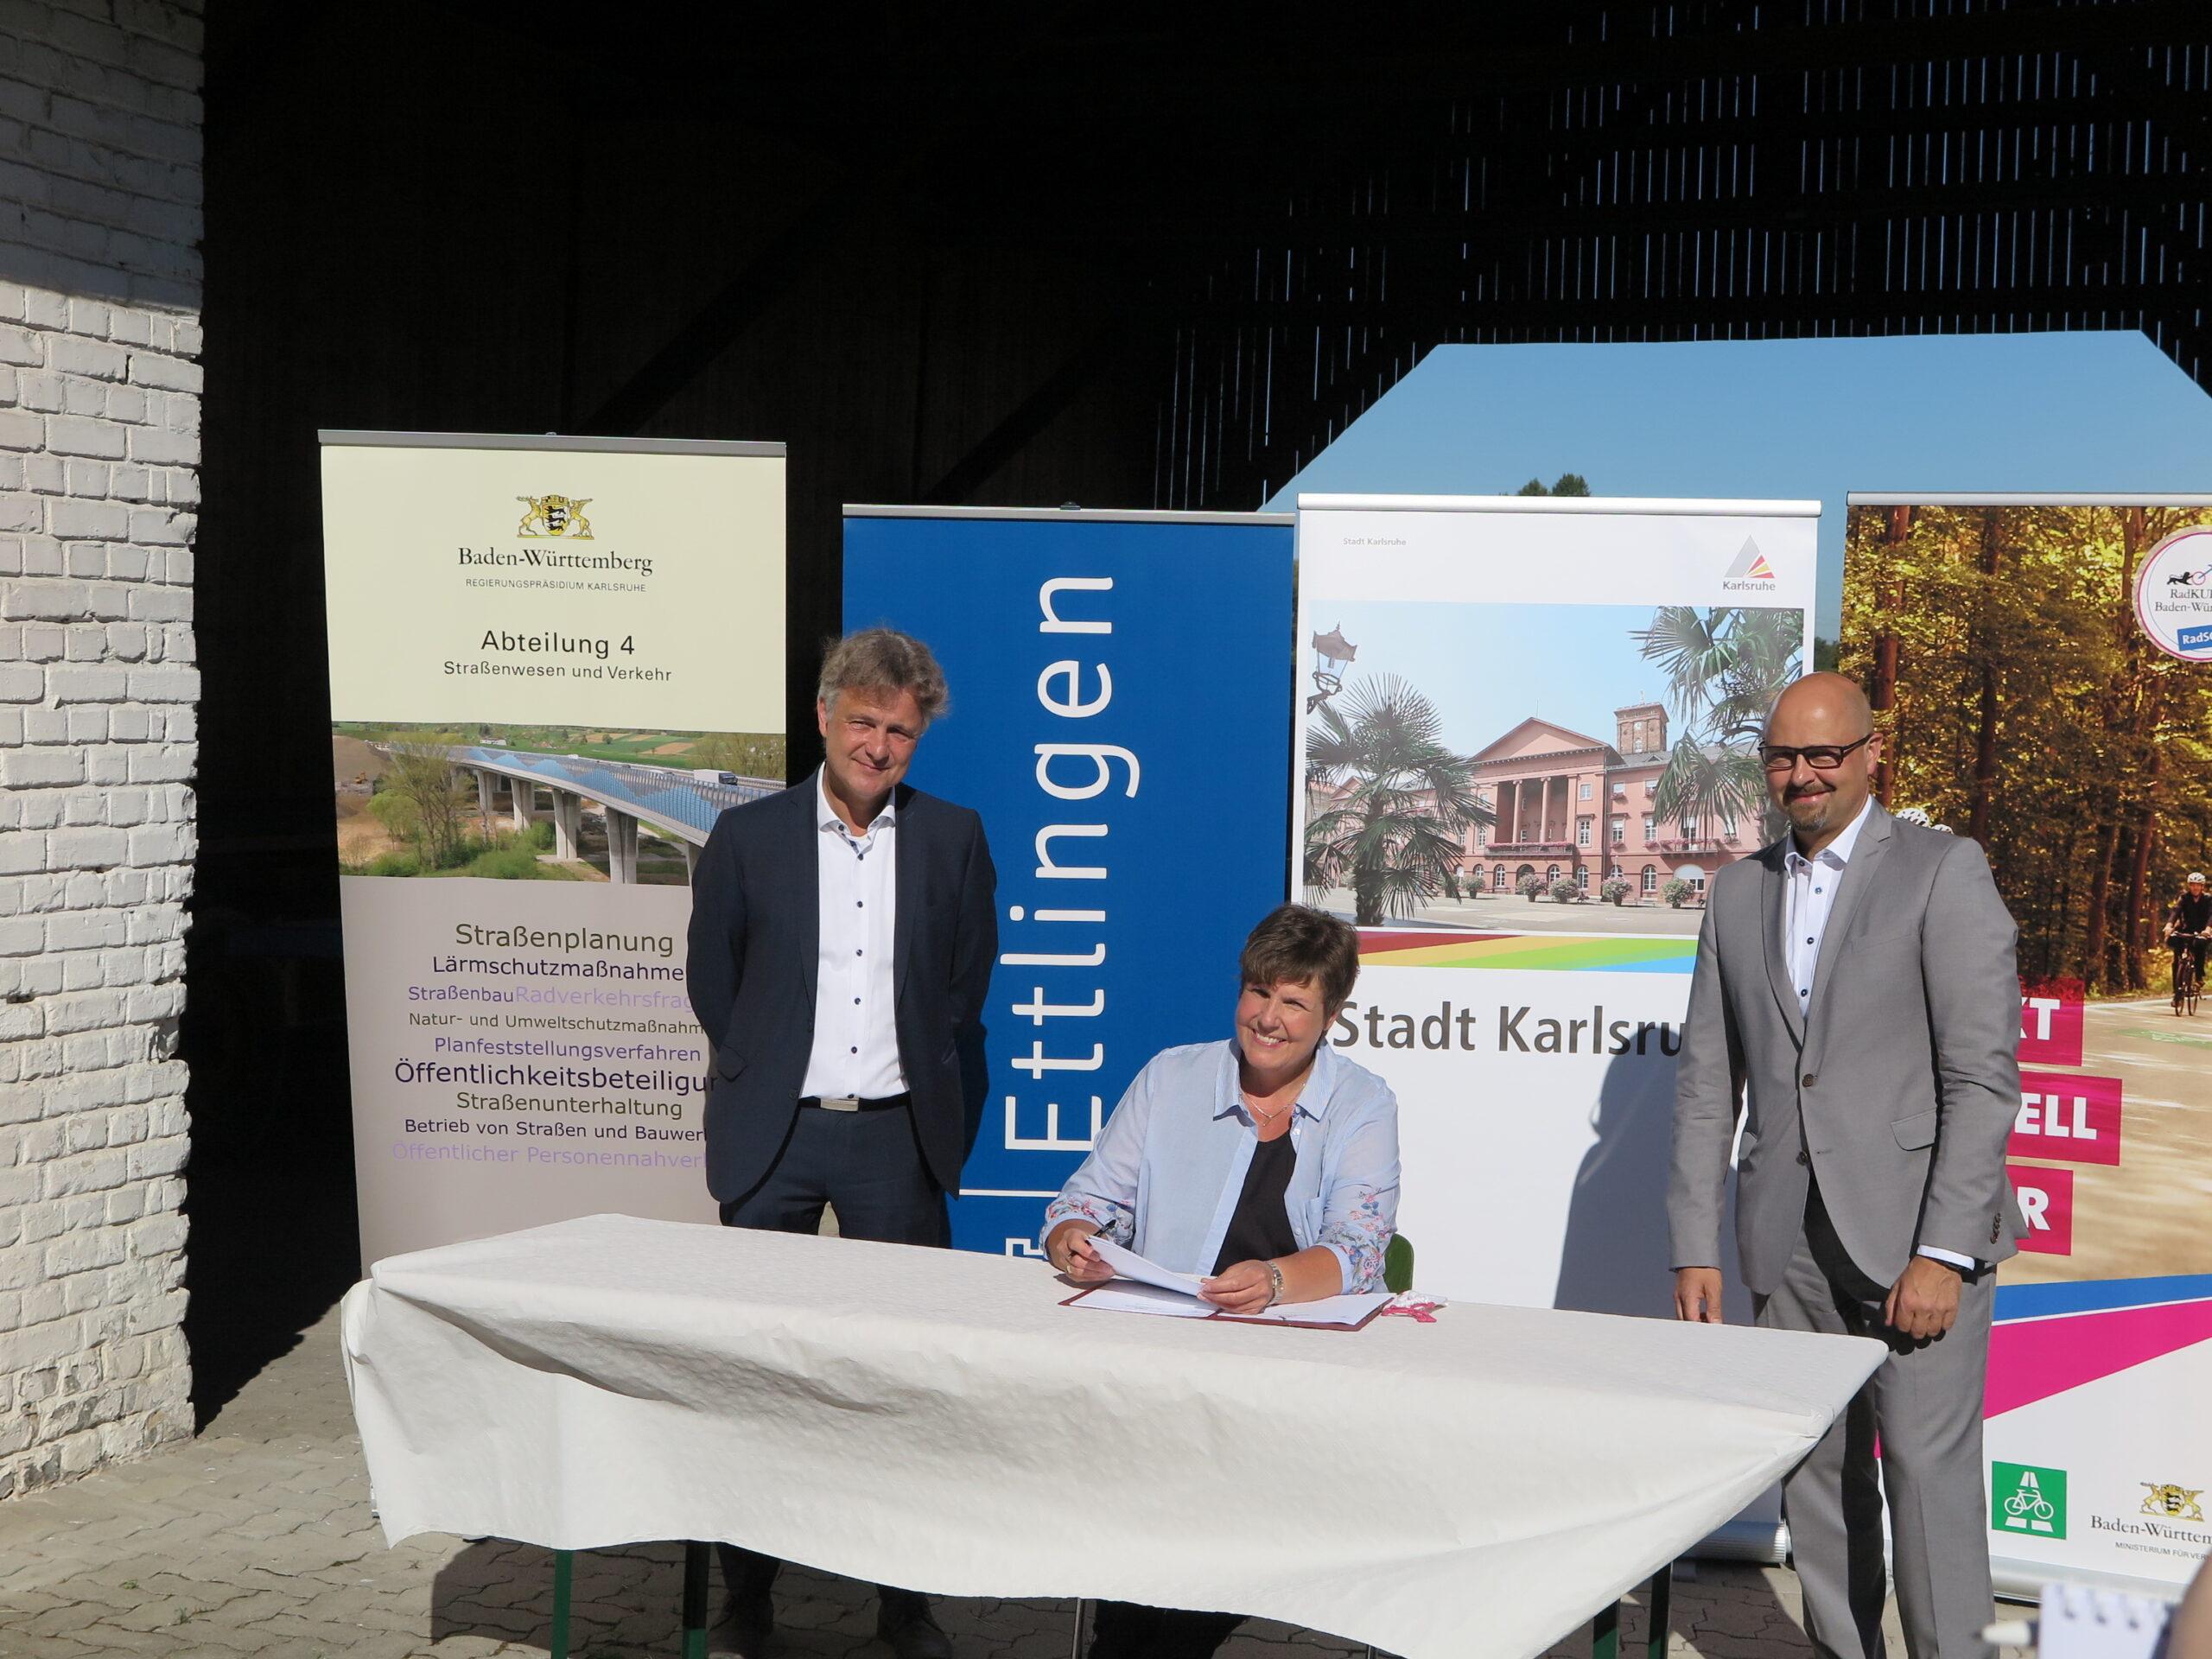 Kraftfahrzeug-Zulassungsstelle Außenstelle Des Landratsamtes Karlsruhe Ettlingen